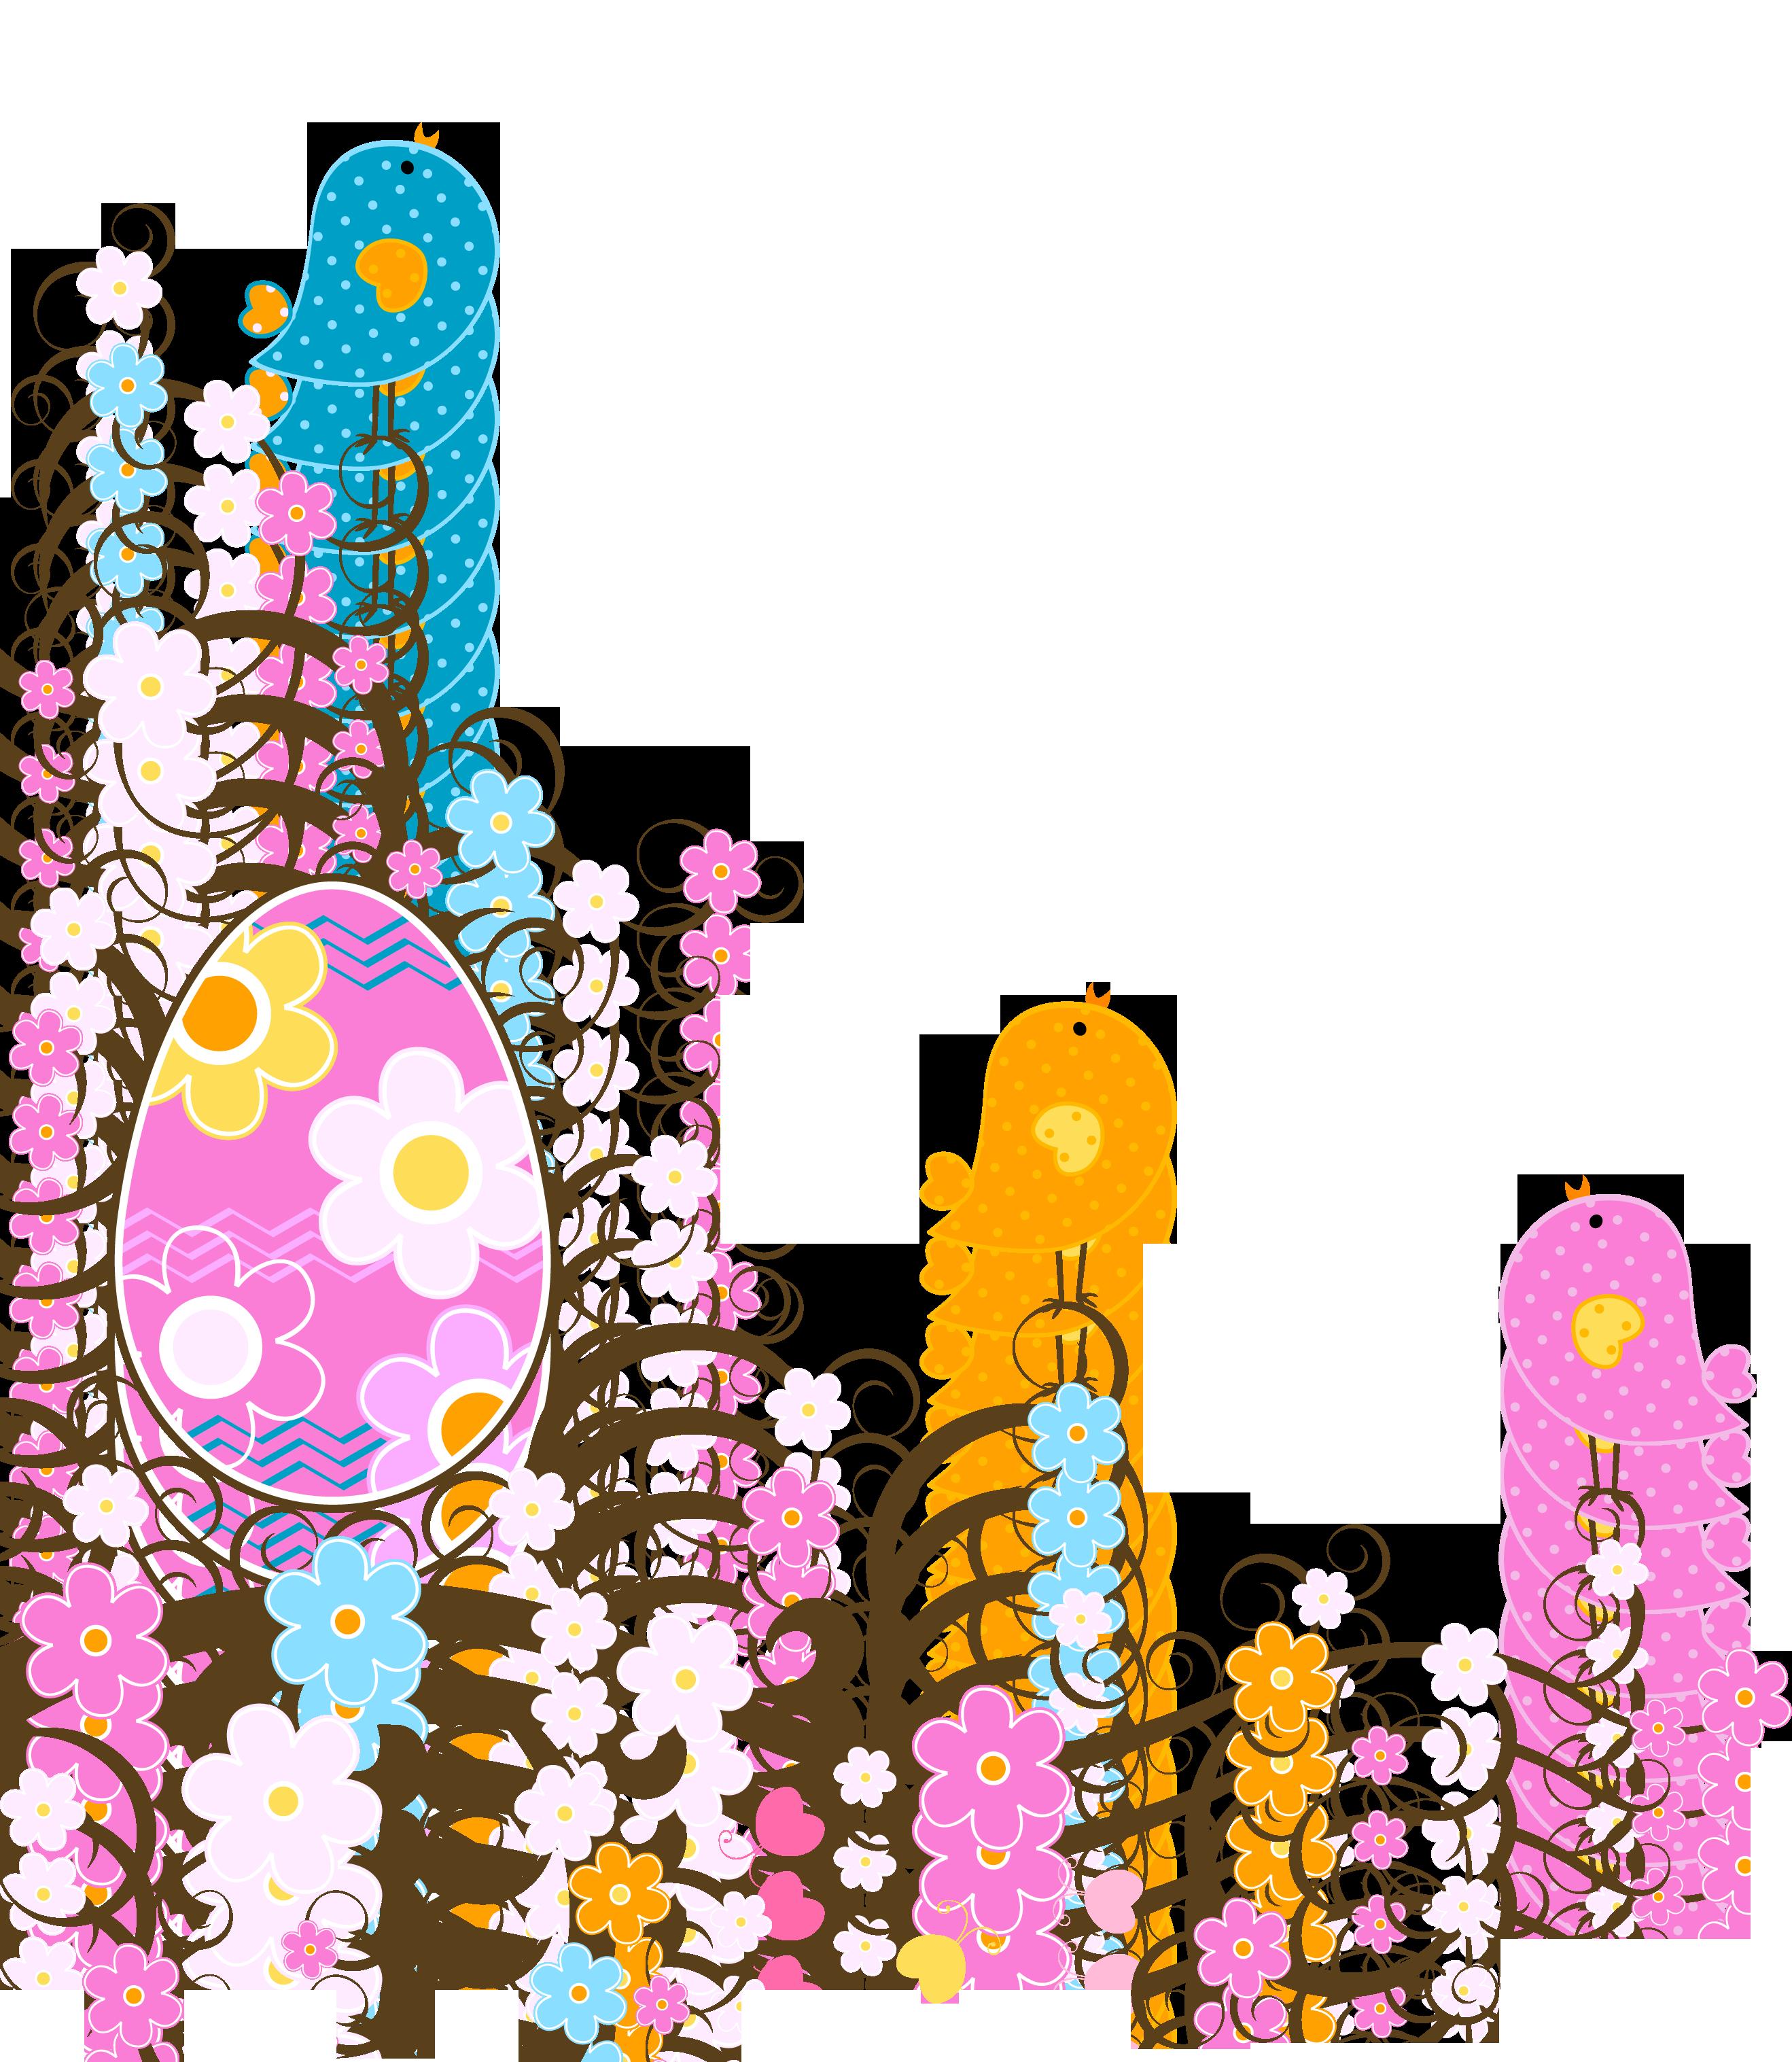 Easter clipart flower png image transparent stock Easter Decoration with Flowers PNG Transparent Clipart image transparent stock